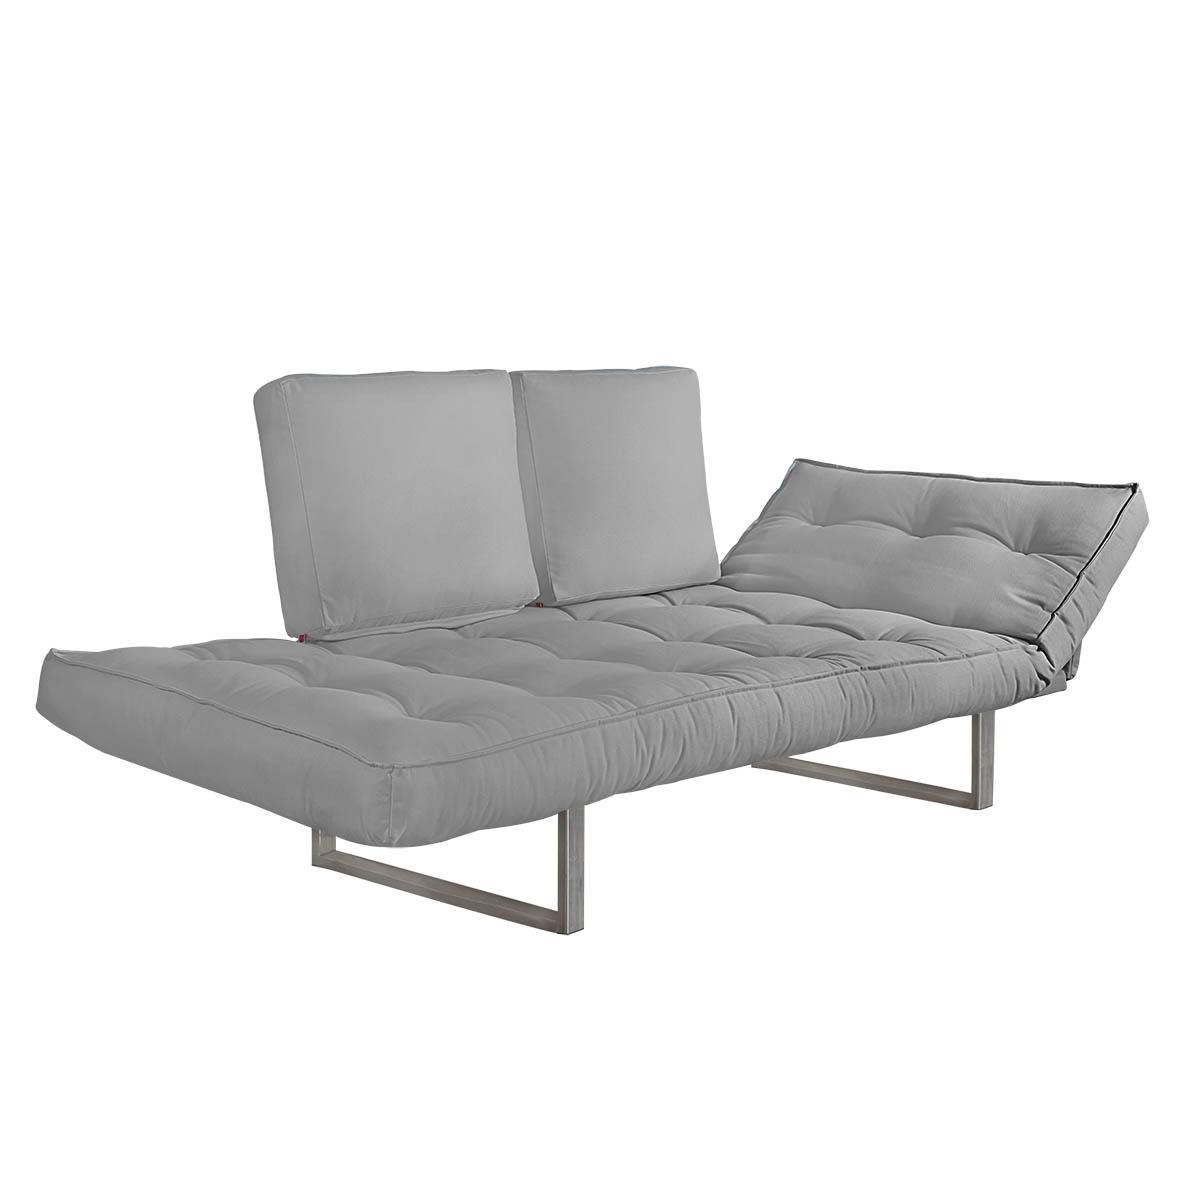 futon sofa cama solsta sleeper sofa ikea sofa cama sofa cama solteiro jpg